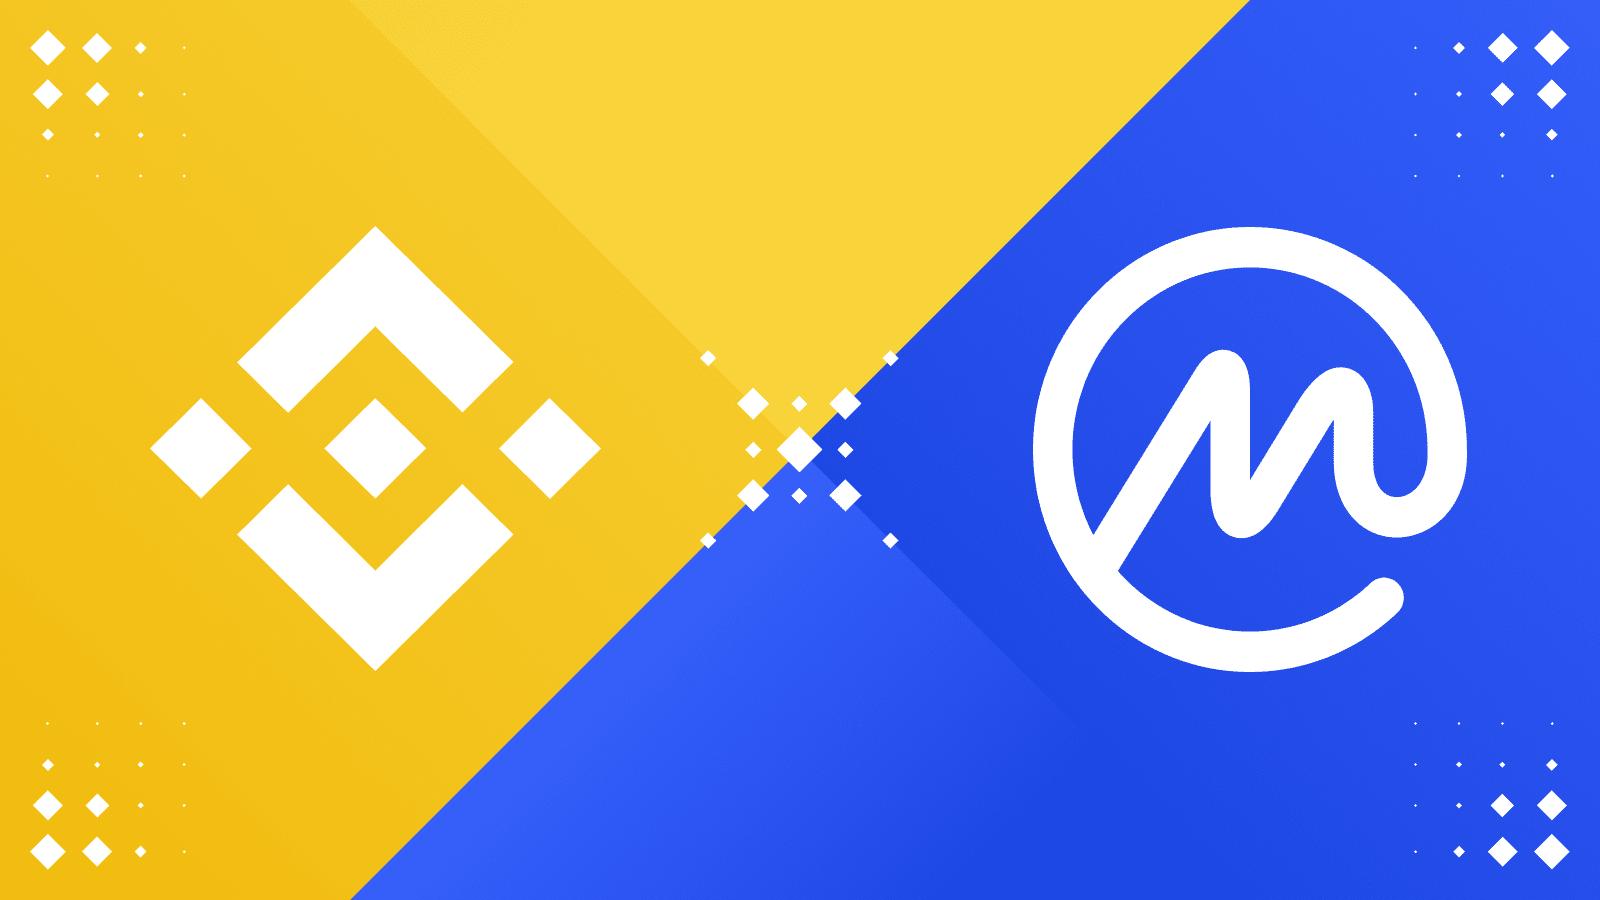 CoinMarketCap Adds Token Swap Feature Through Uniswap Integration